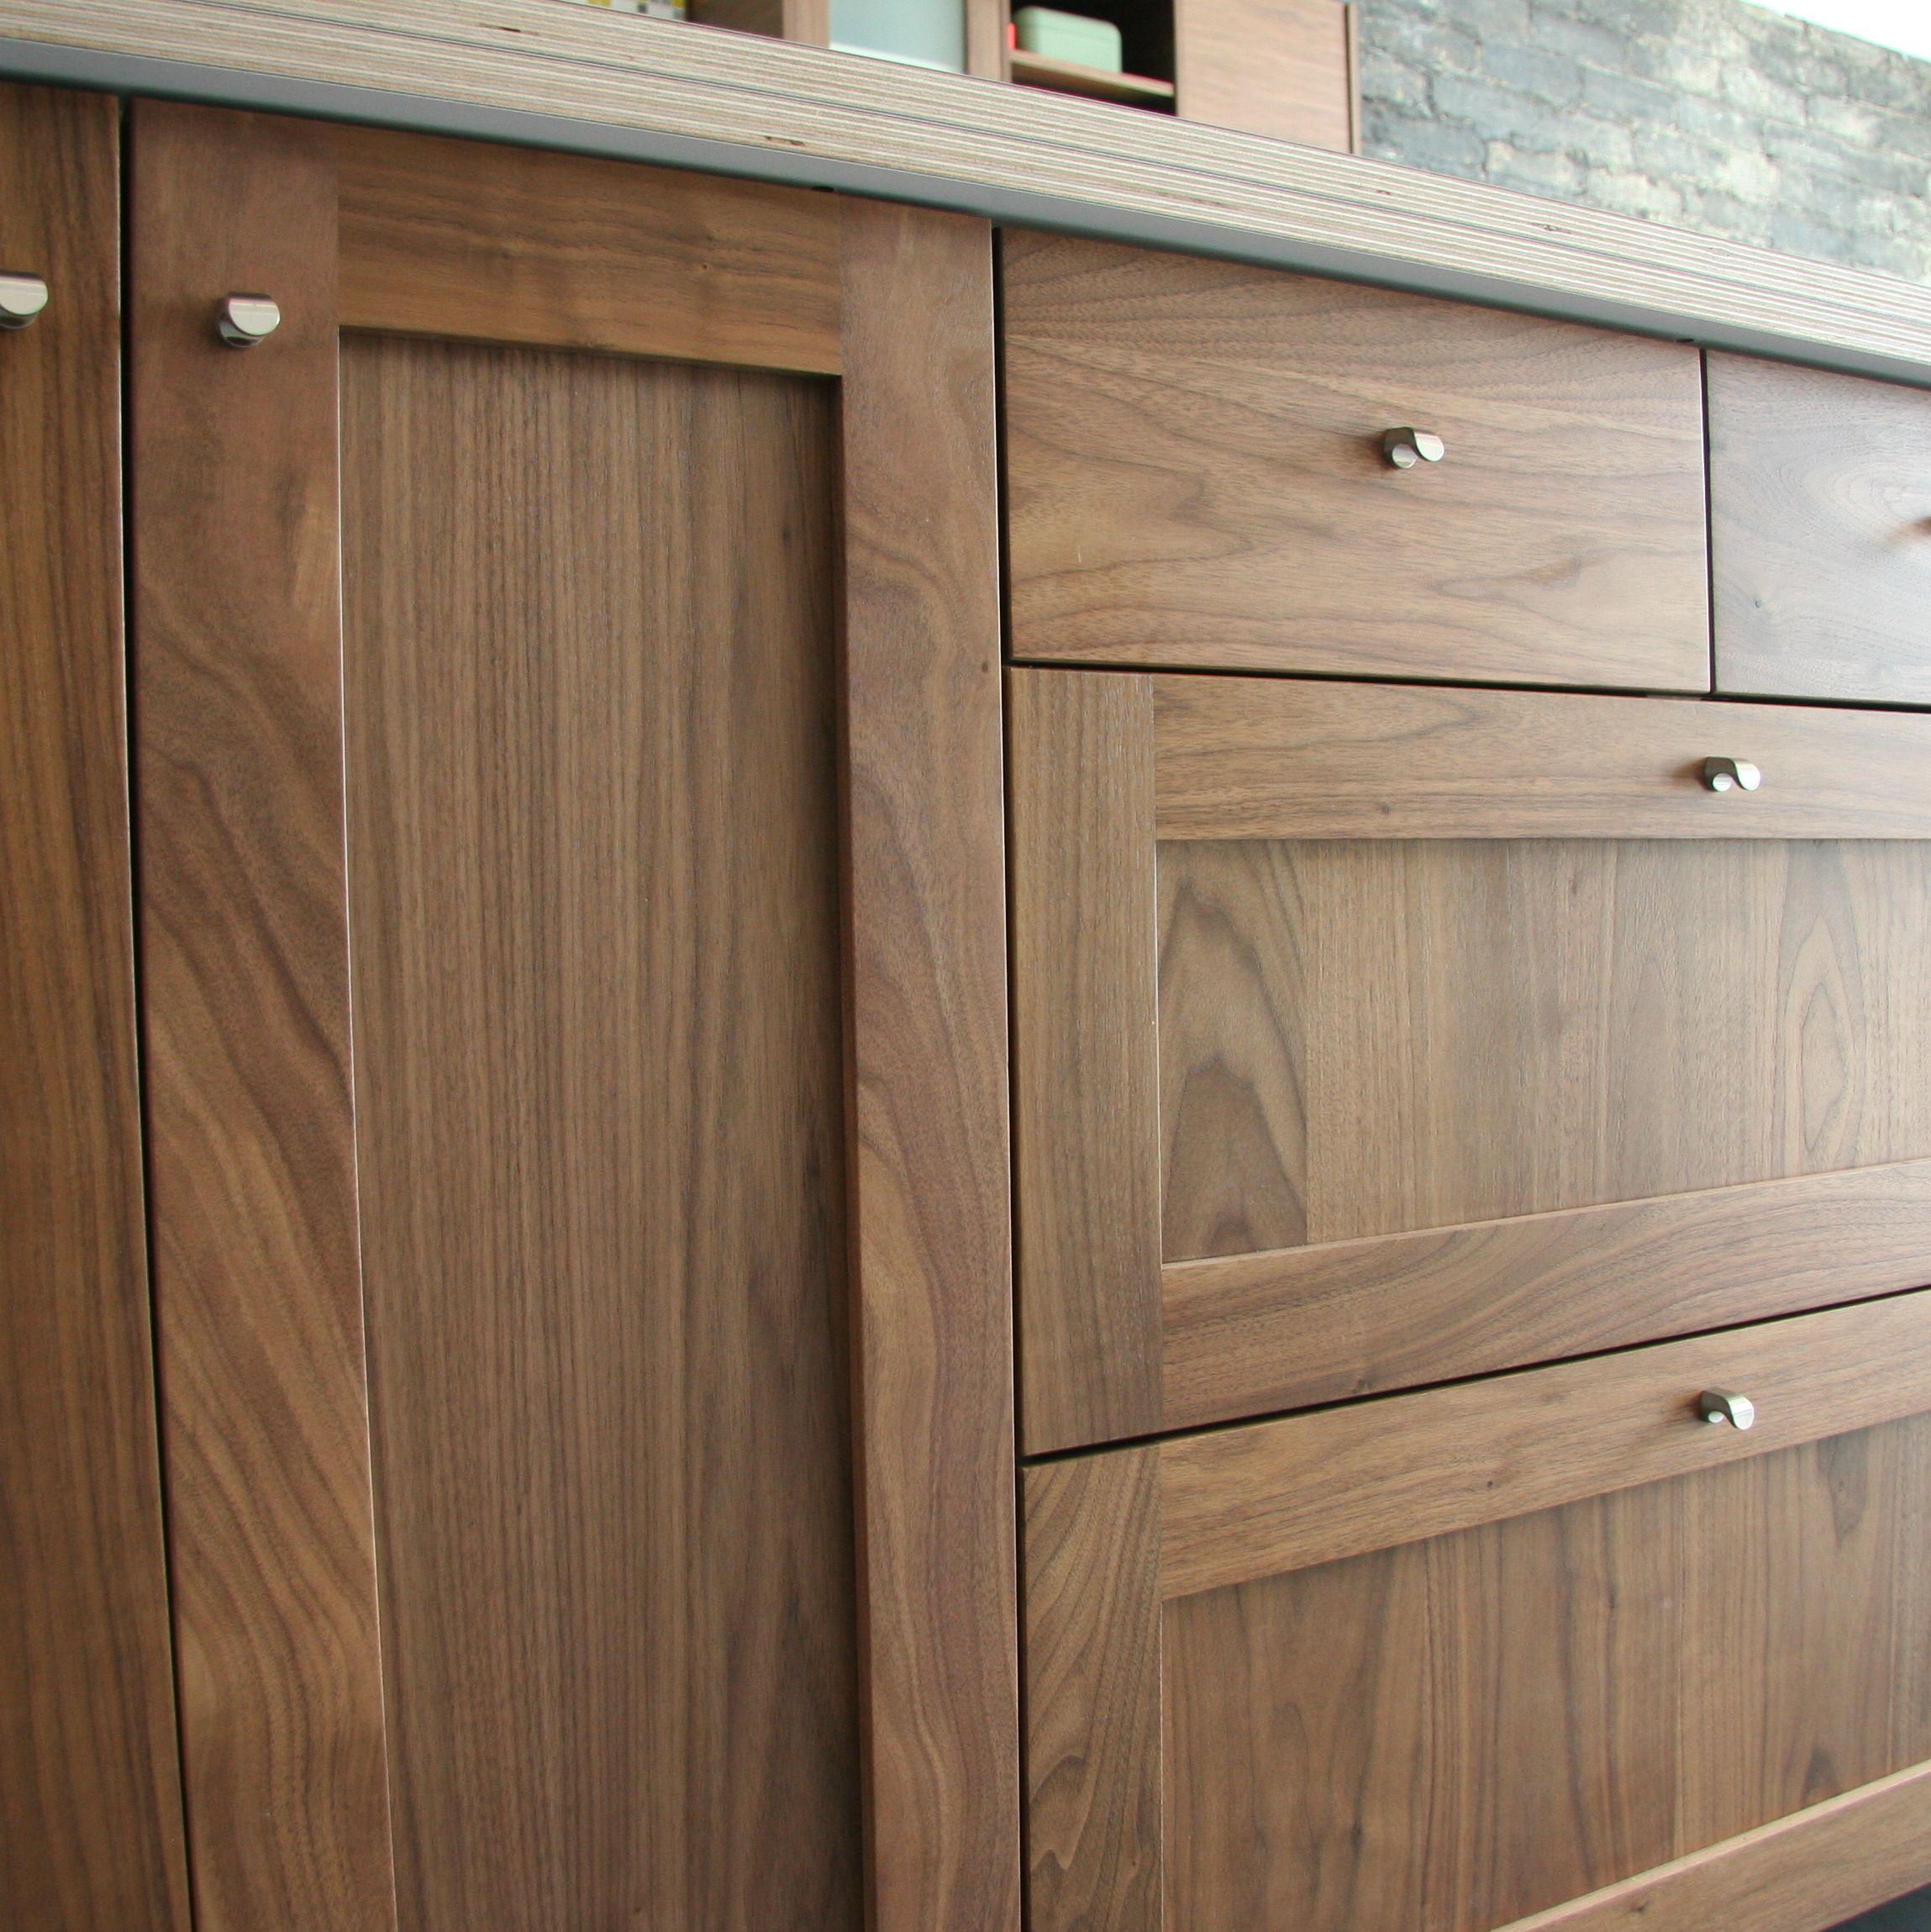 walnut kitchen cabinets colored detail shot of semihandmade shaker ikea kitchens in